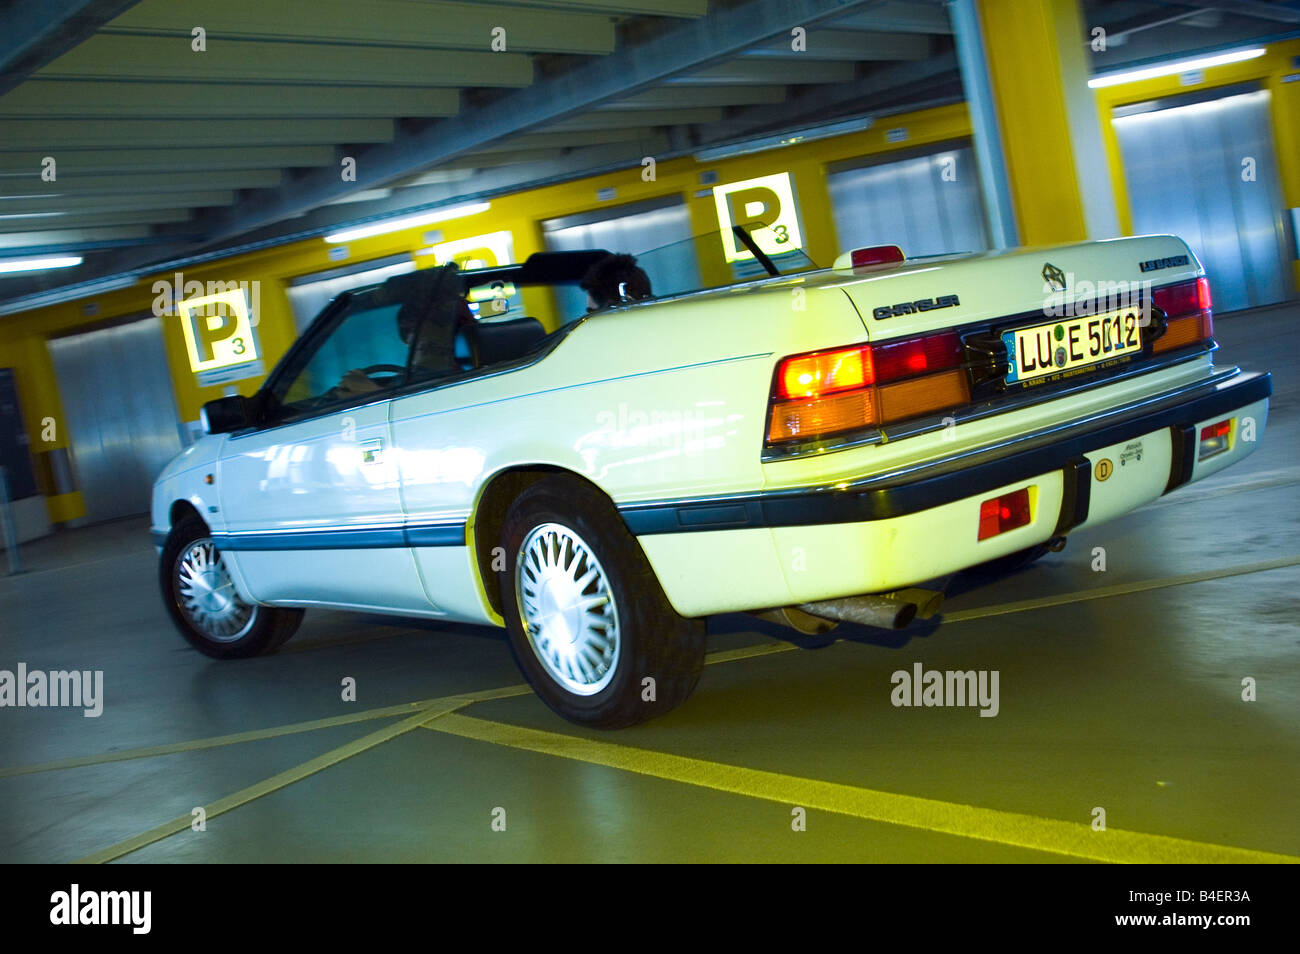 car chrysler lebaron convertible model year 1986 1995 white old car